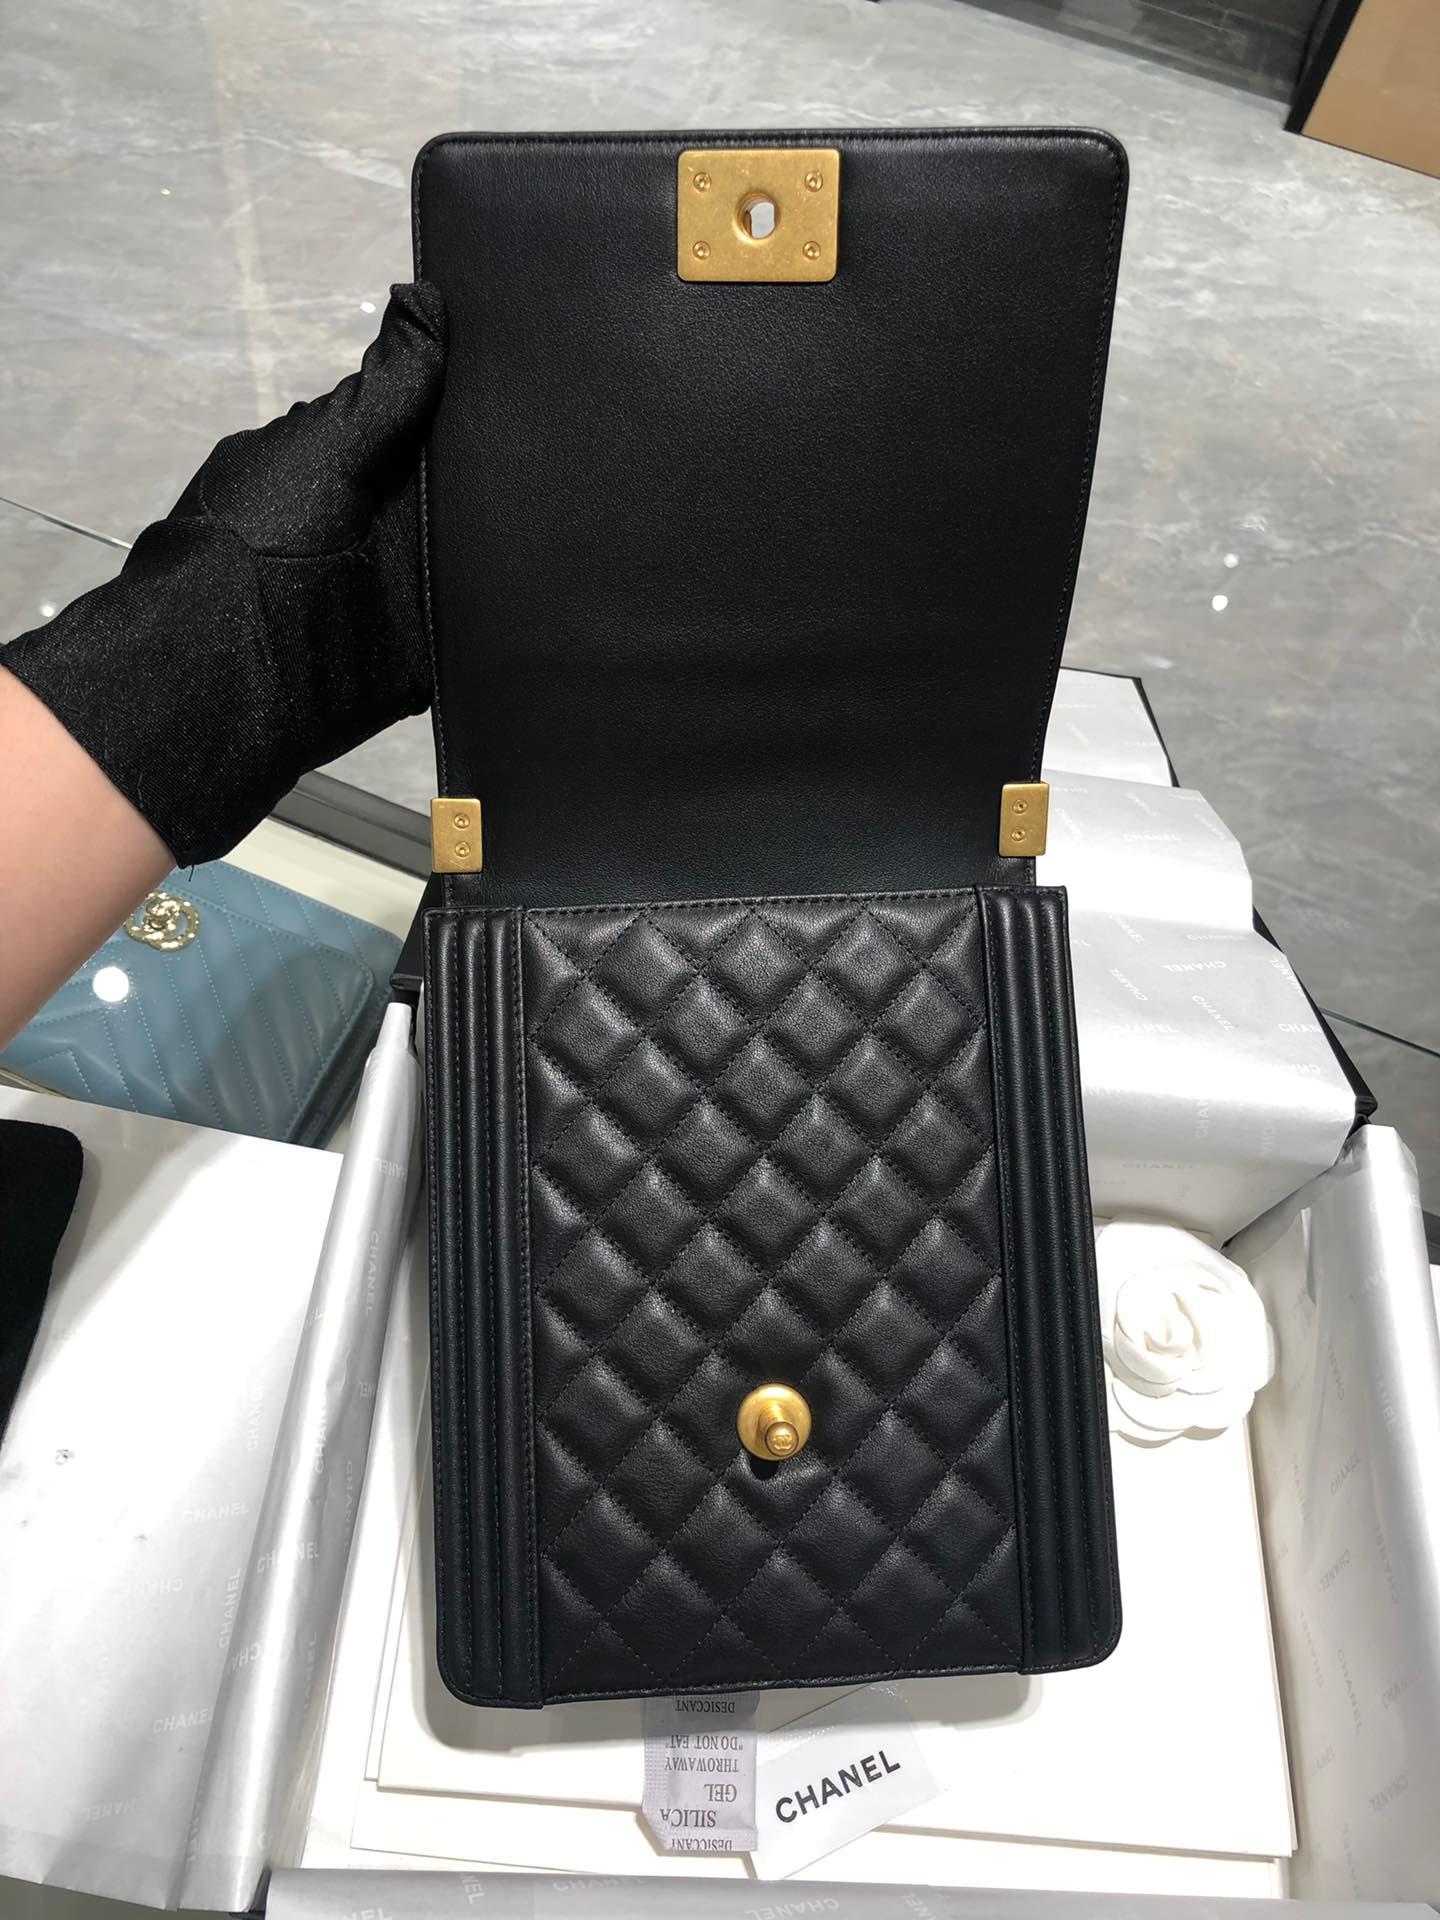 Chanel 走秀款竖版leboy原厂胎牛皮 磨砂金扣 顶级版本